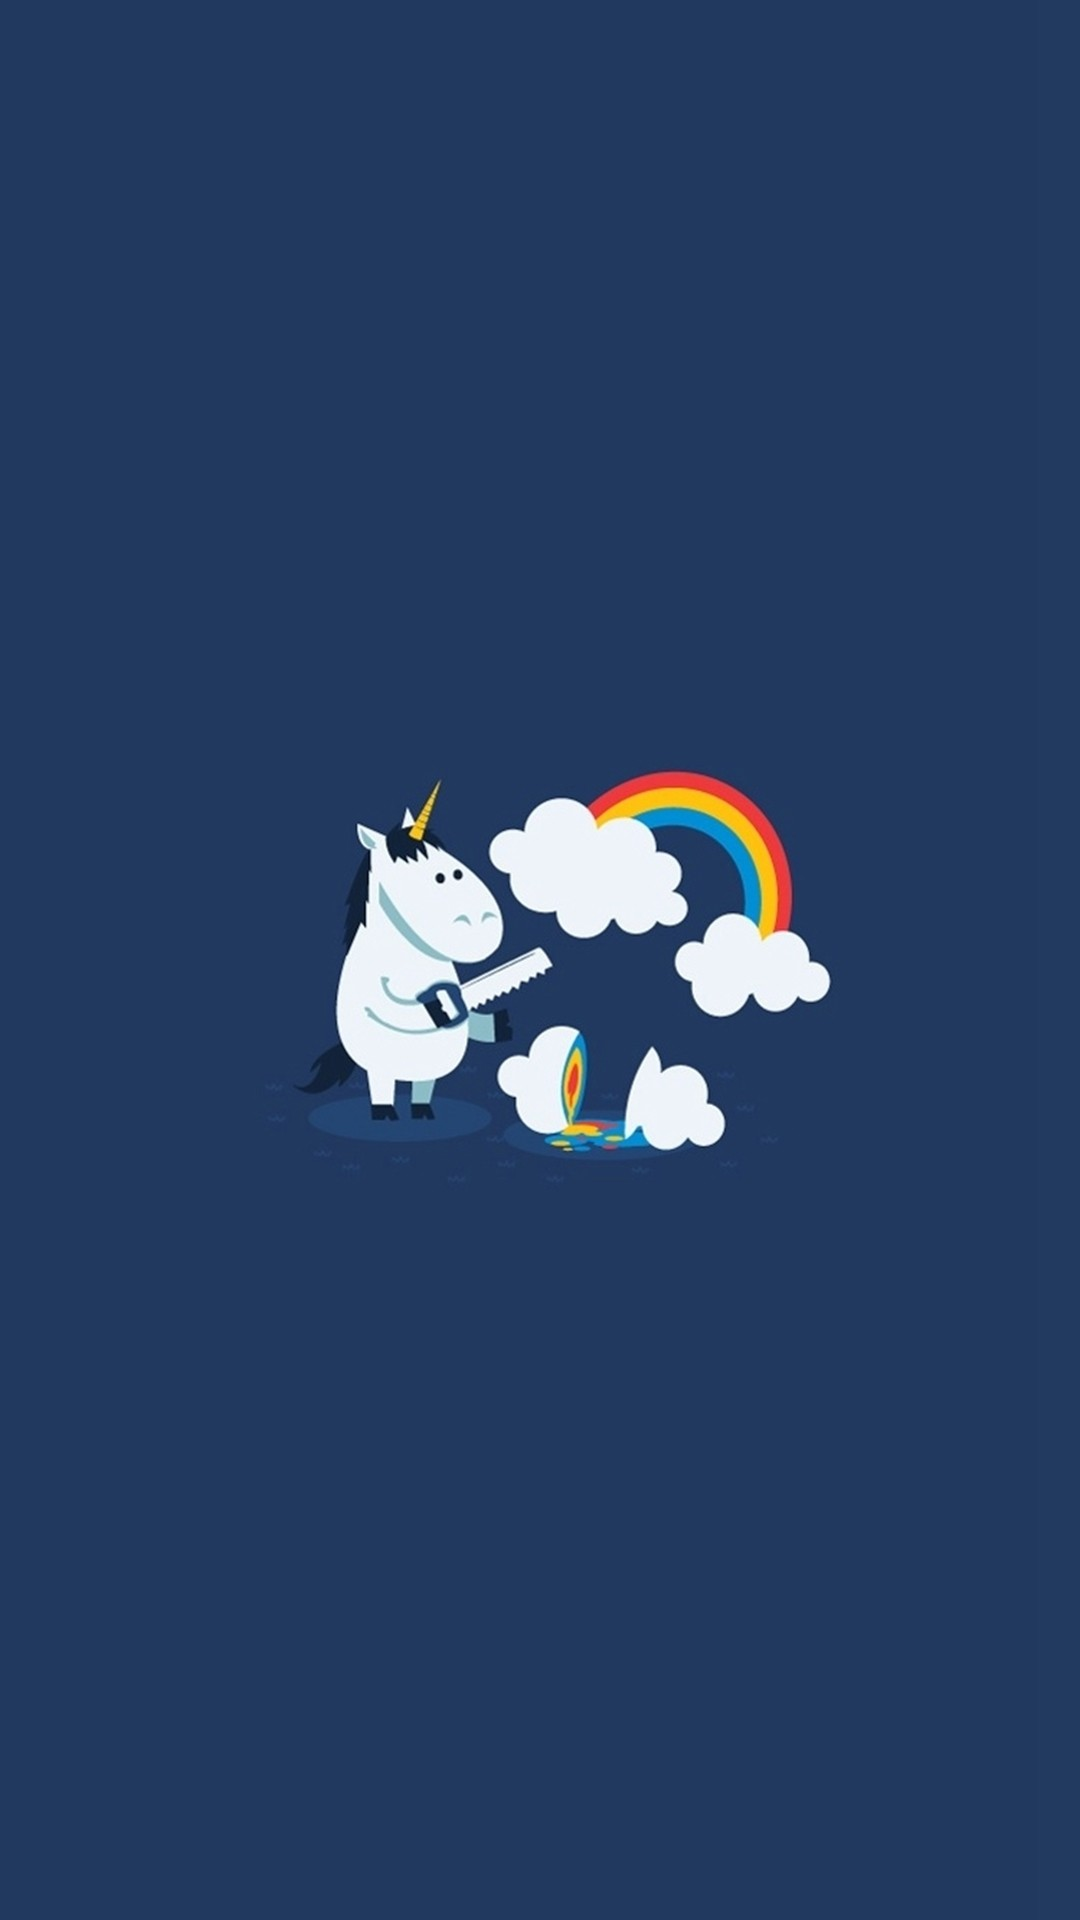 Unicorn Saw Clouds Rainbow Funny iPhone 6 Wallpaper Unicorn Saw.